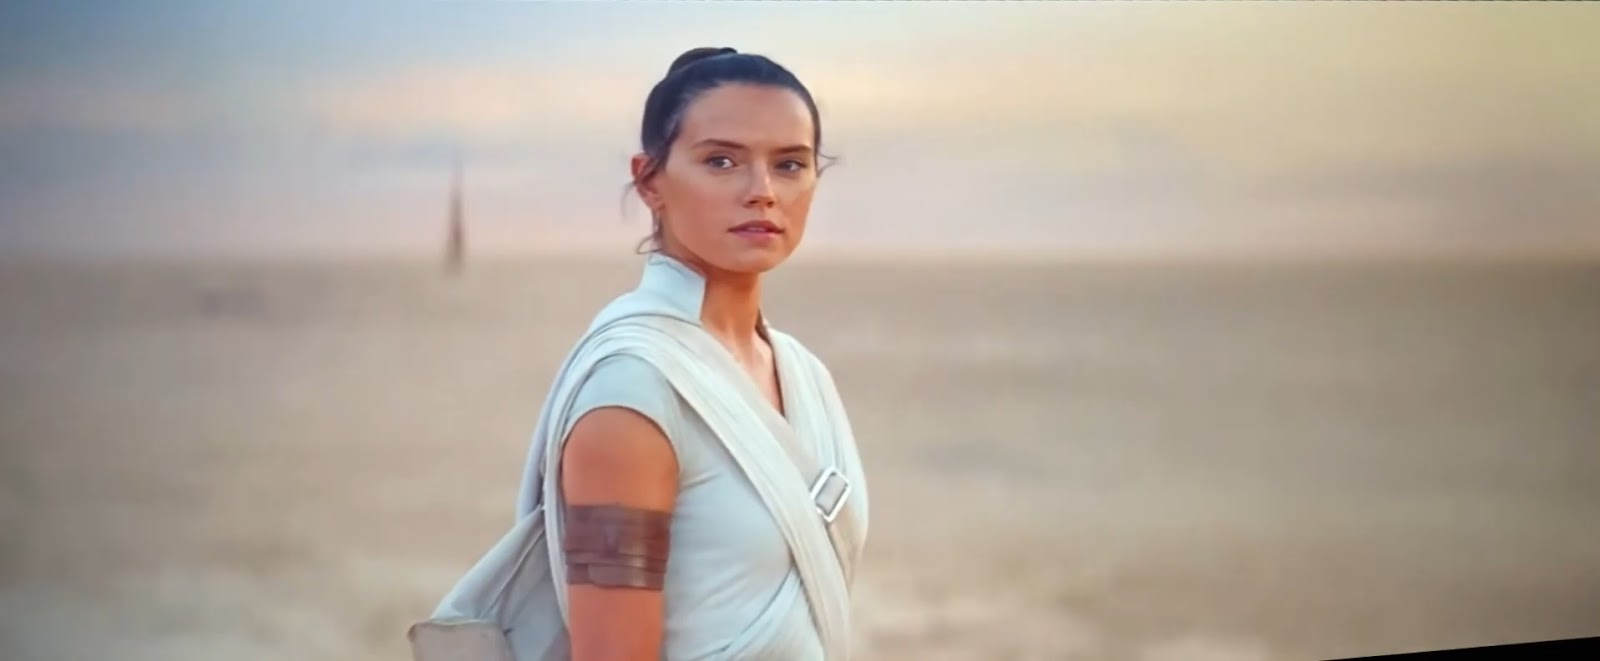 Star+Wars+El+ascenso+de+Skywalker+%282019%29+HDTS+1080p+Latino+-+Ingles.mkv_snapshot_02.11.47.233.jpg (1600×661)